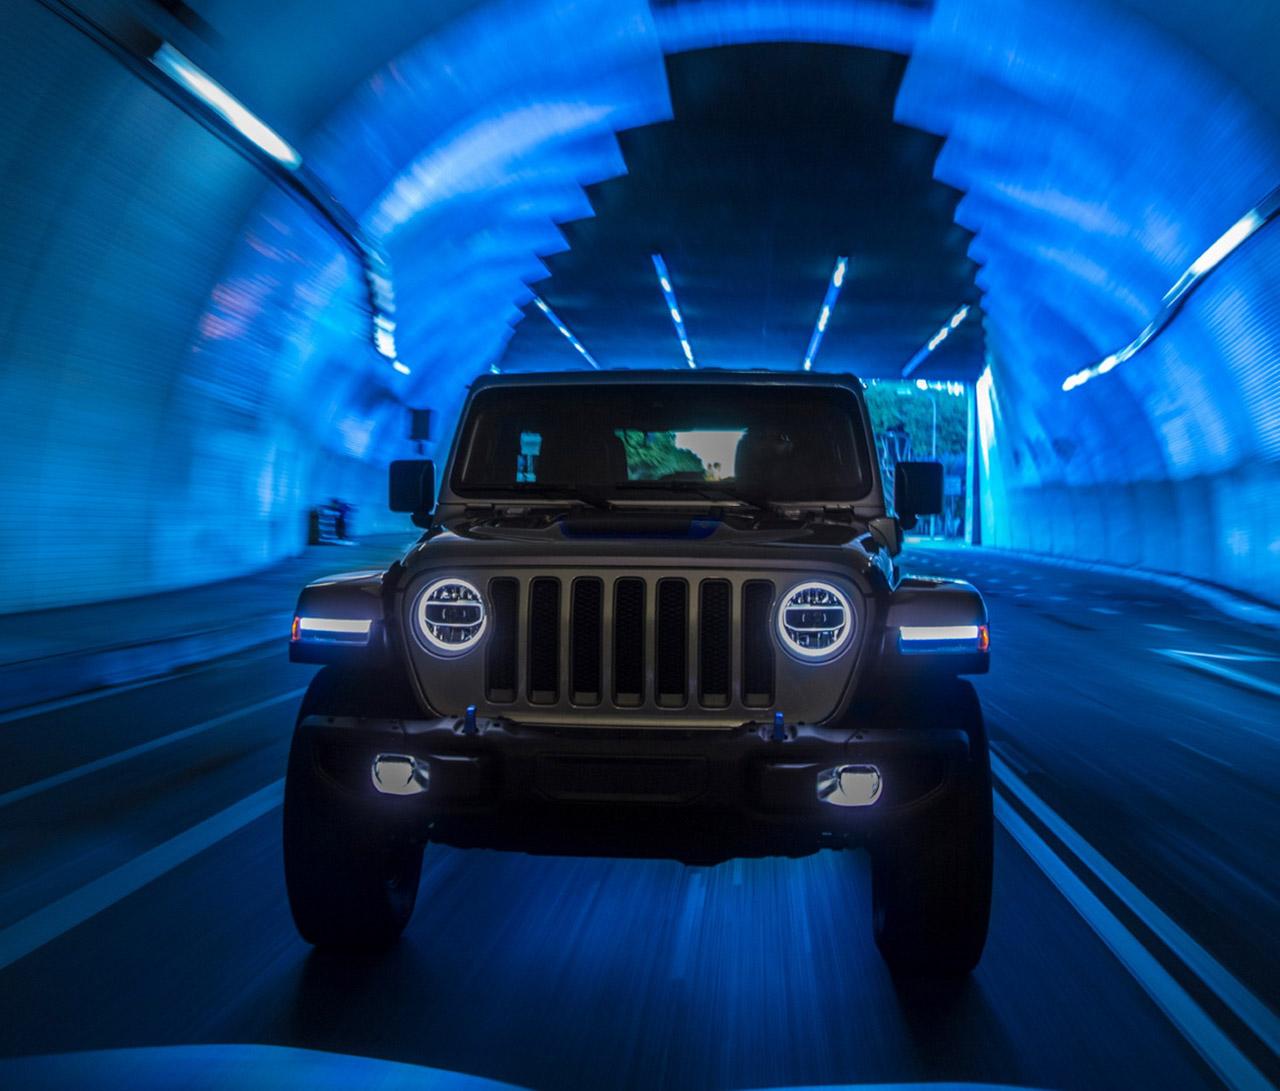 2021 Jeep Wrangler 4xe Plug-in Hybrid Electric